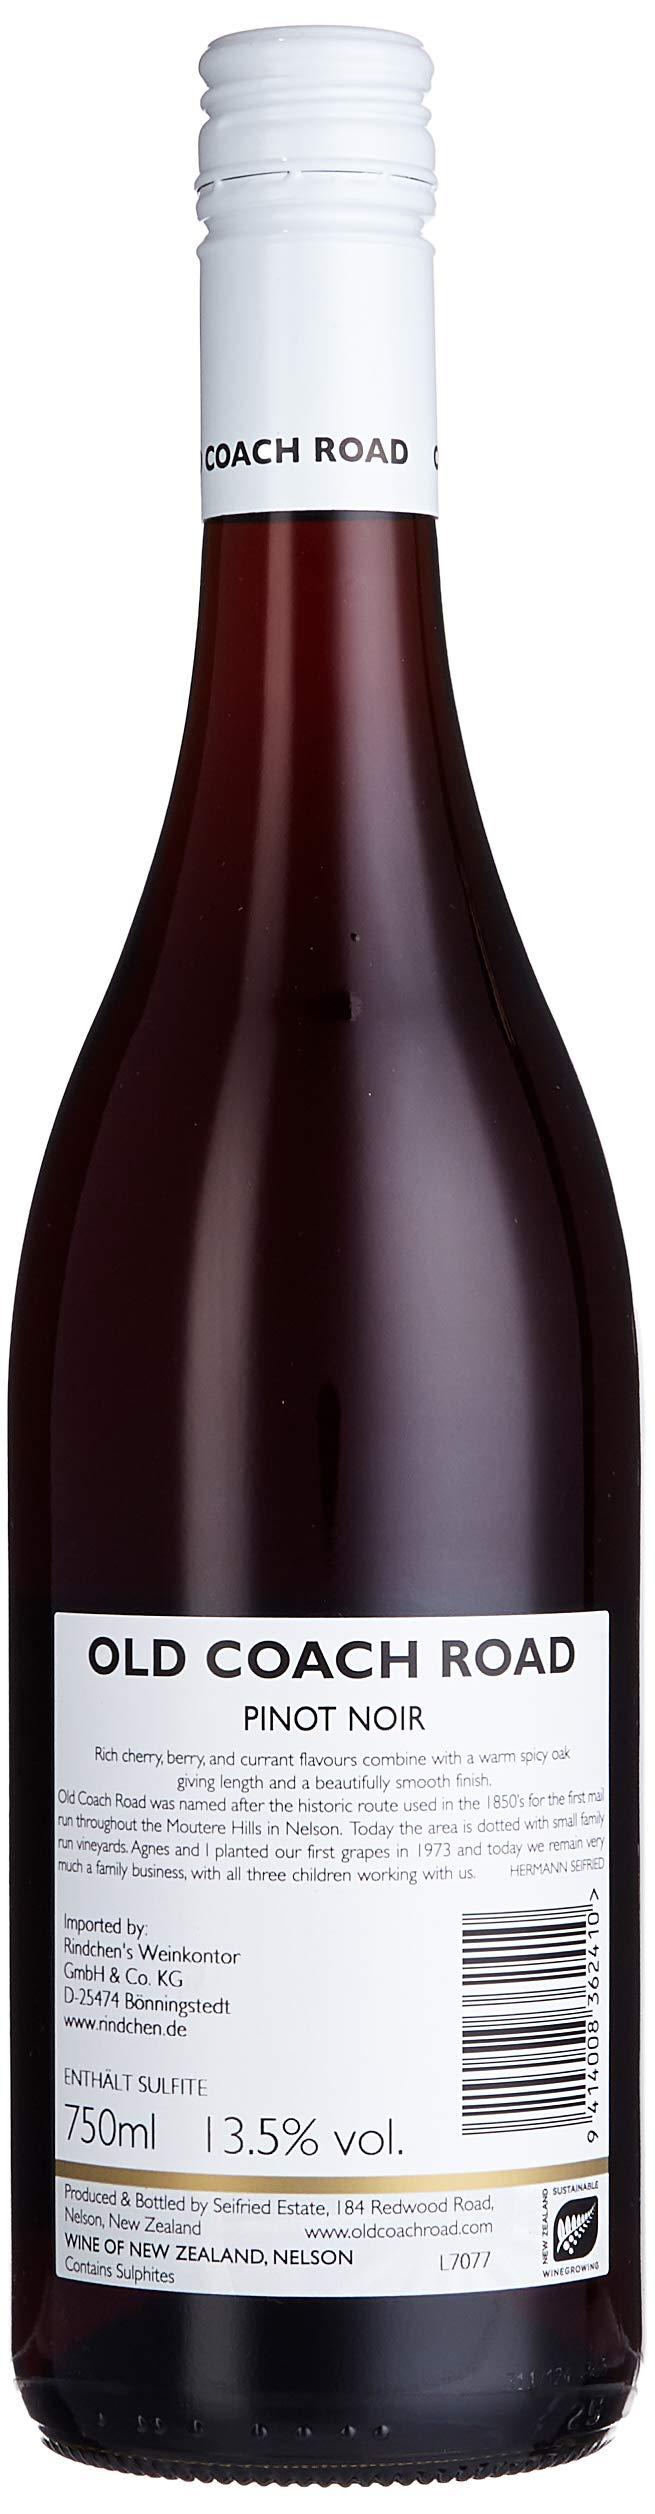 Pinot-Noir-Old-Coach-Road-Pinot-Noir-2016-trocken-6-x-075-l